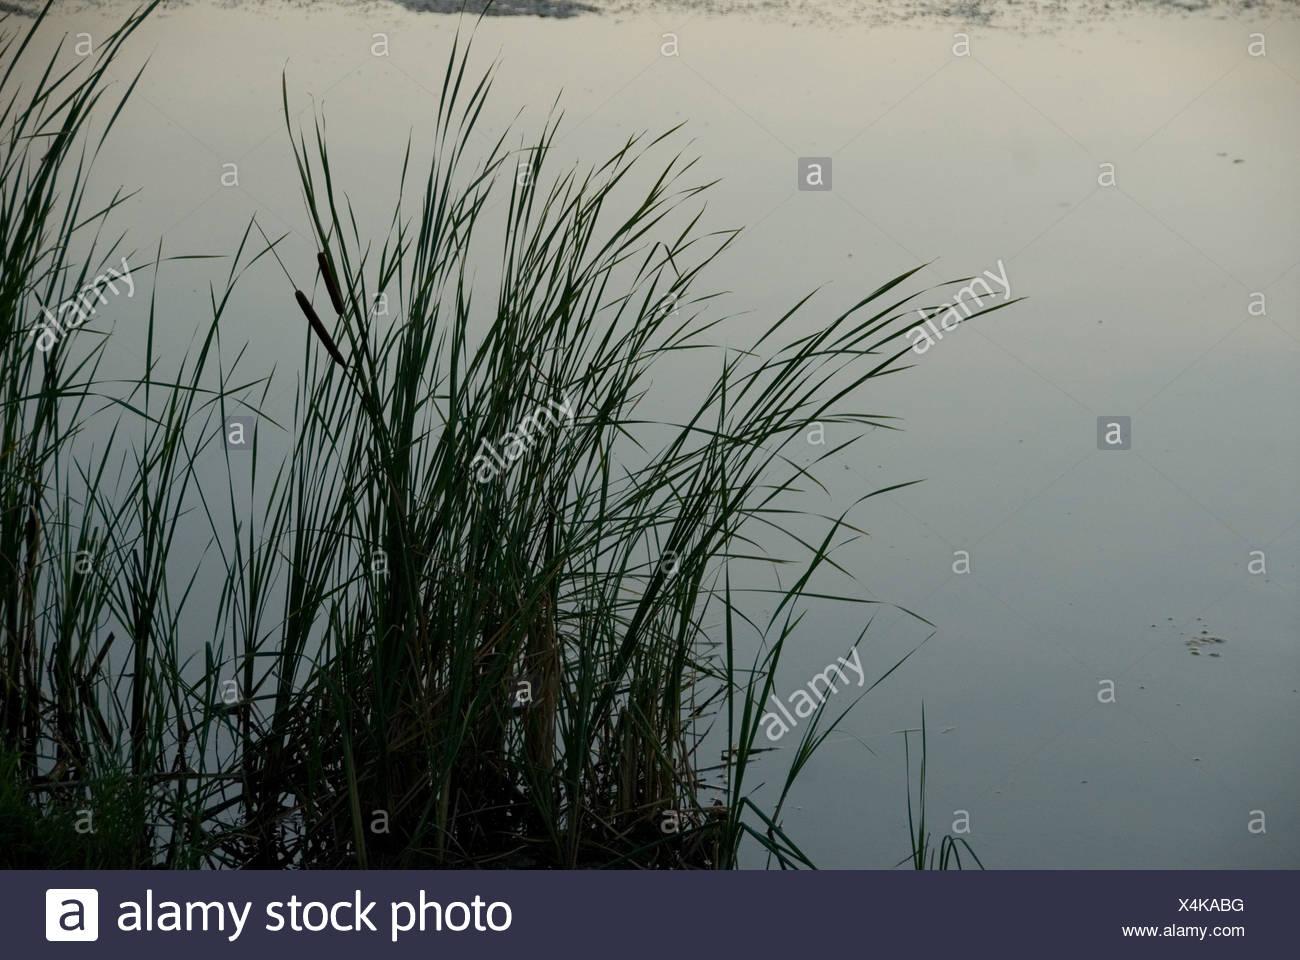 Grass grows by a body of water near Bennet, Nebraska. - Stock Image